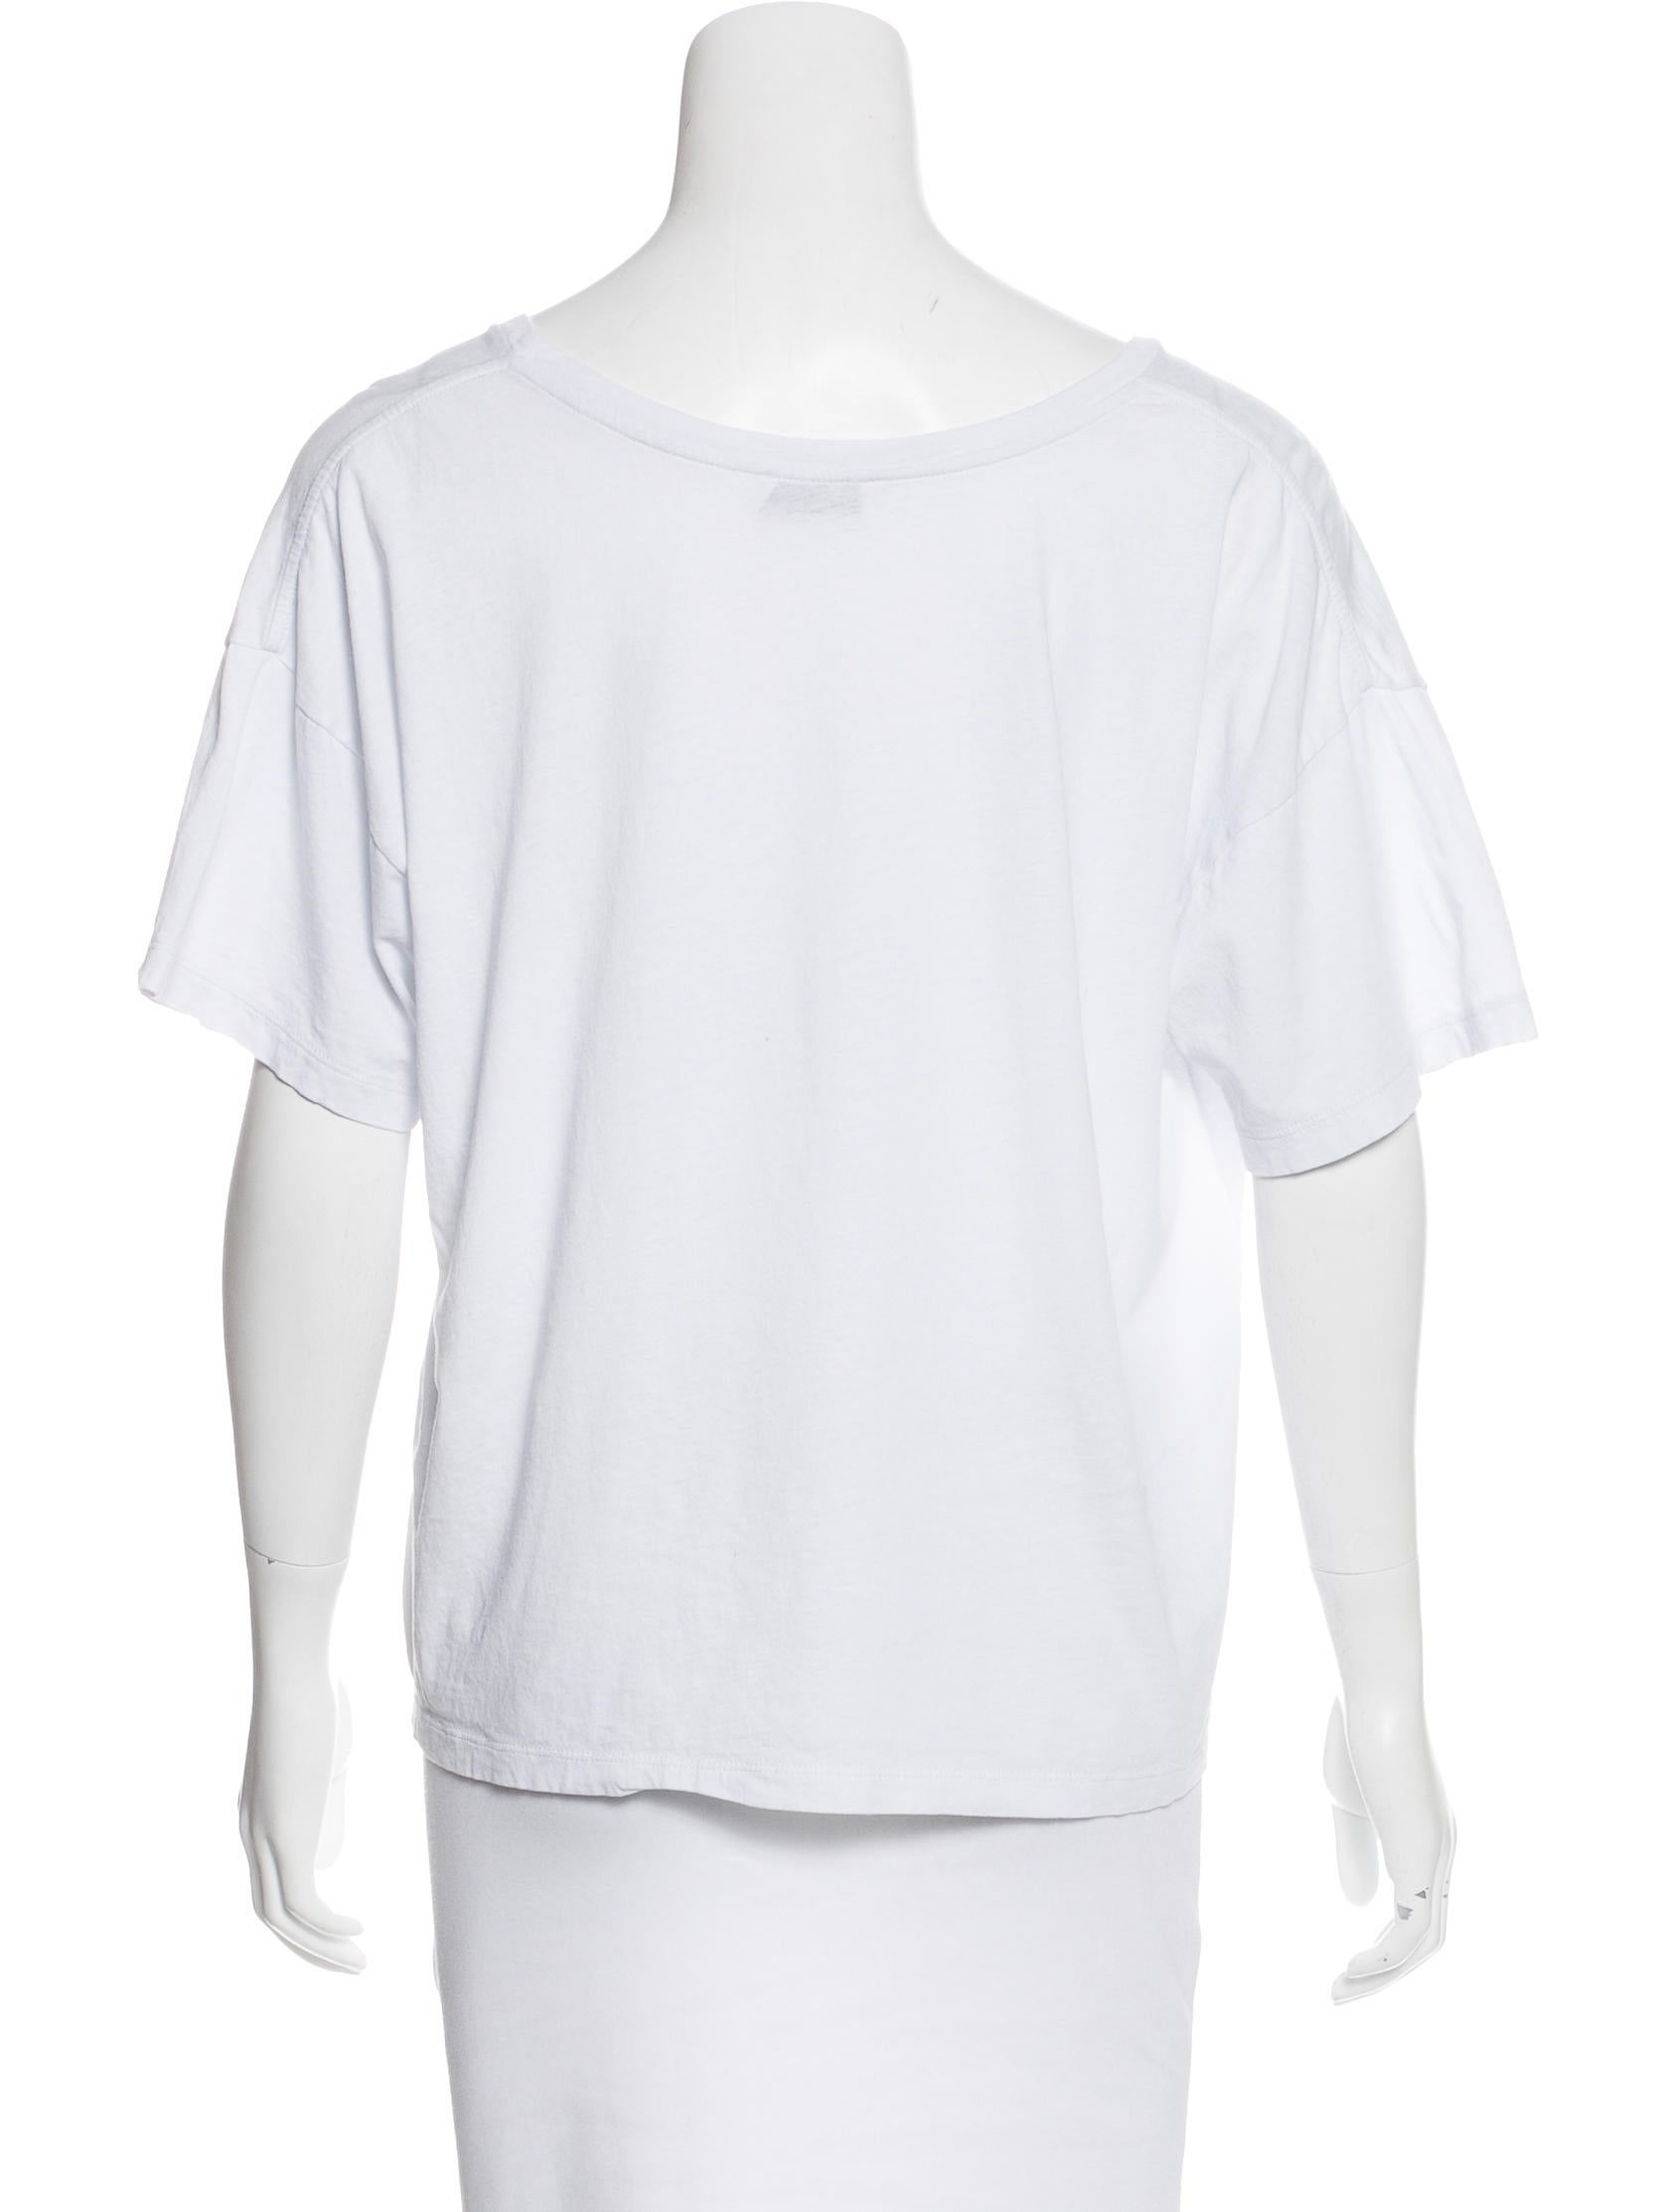 Saint laurent distressed short sleeve t shirt clothing for Saint laurent shirt womens